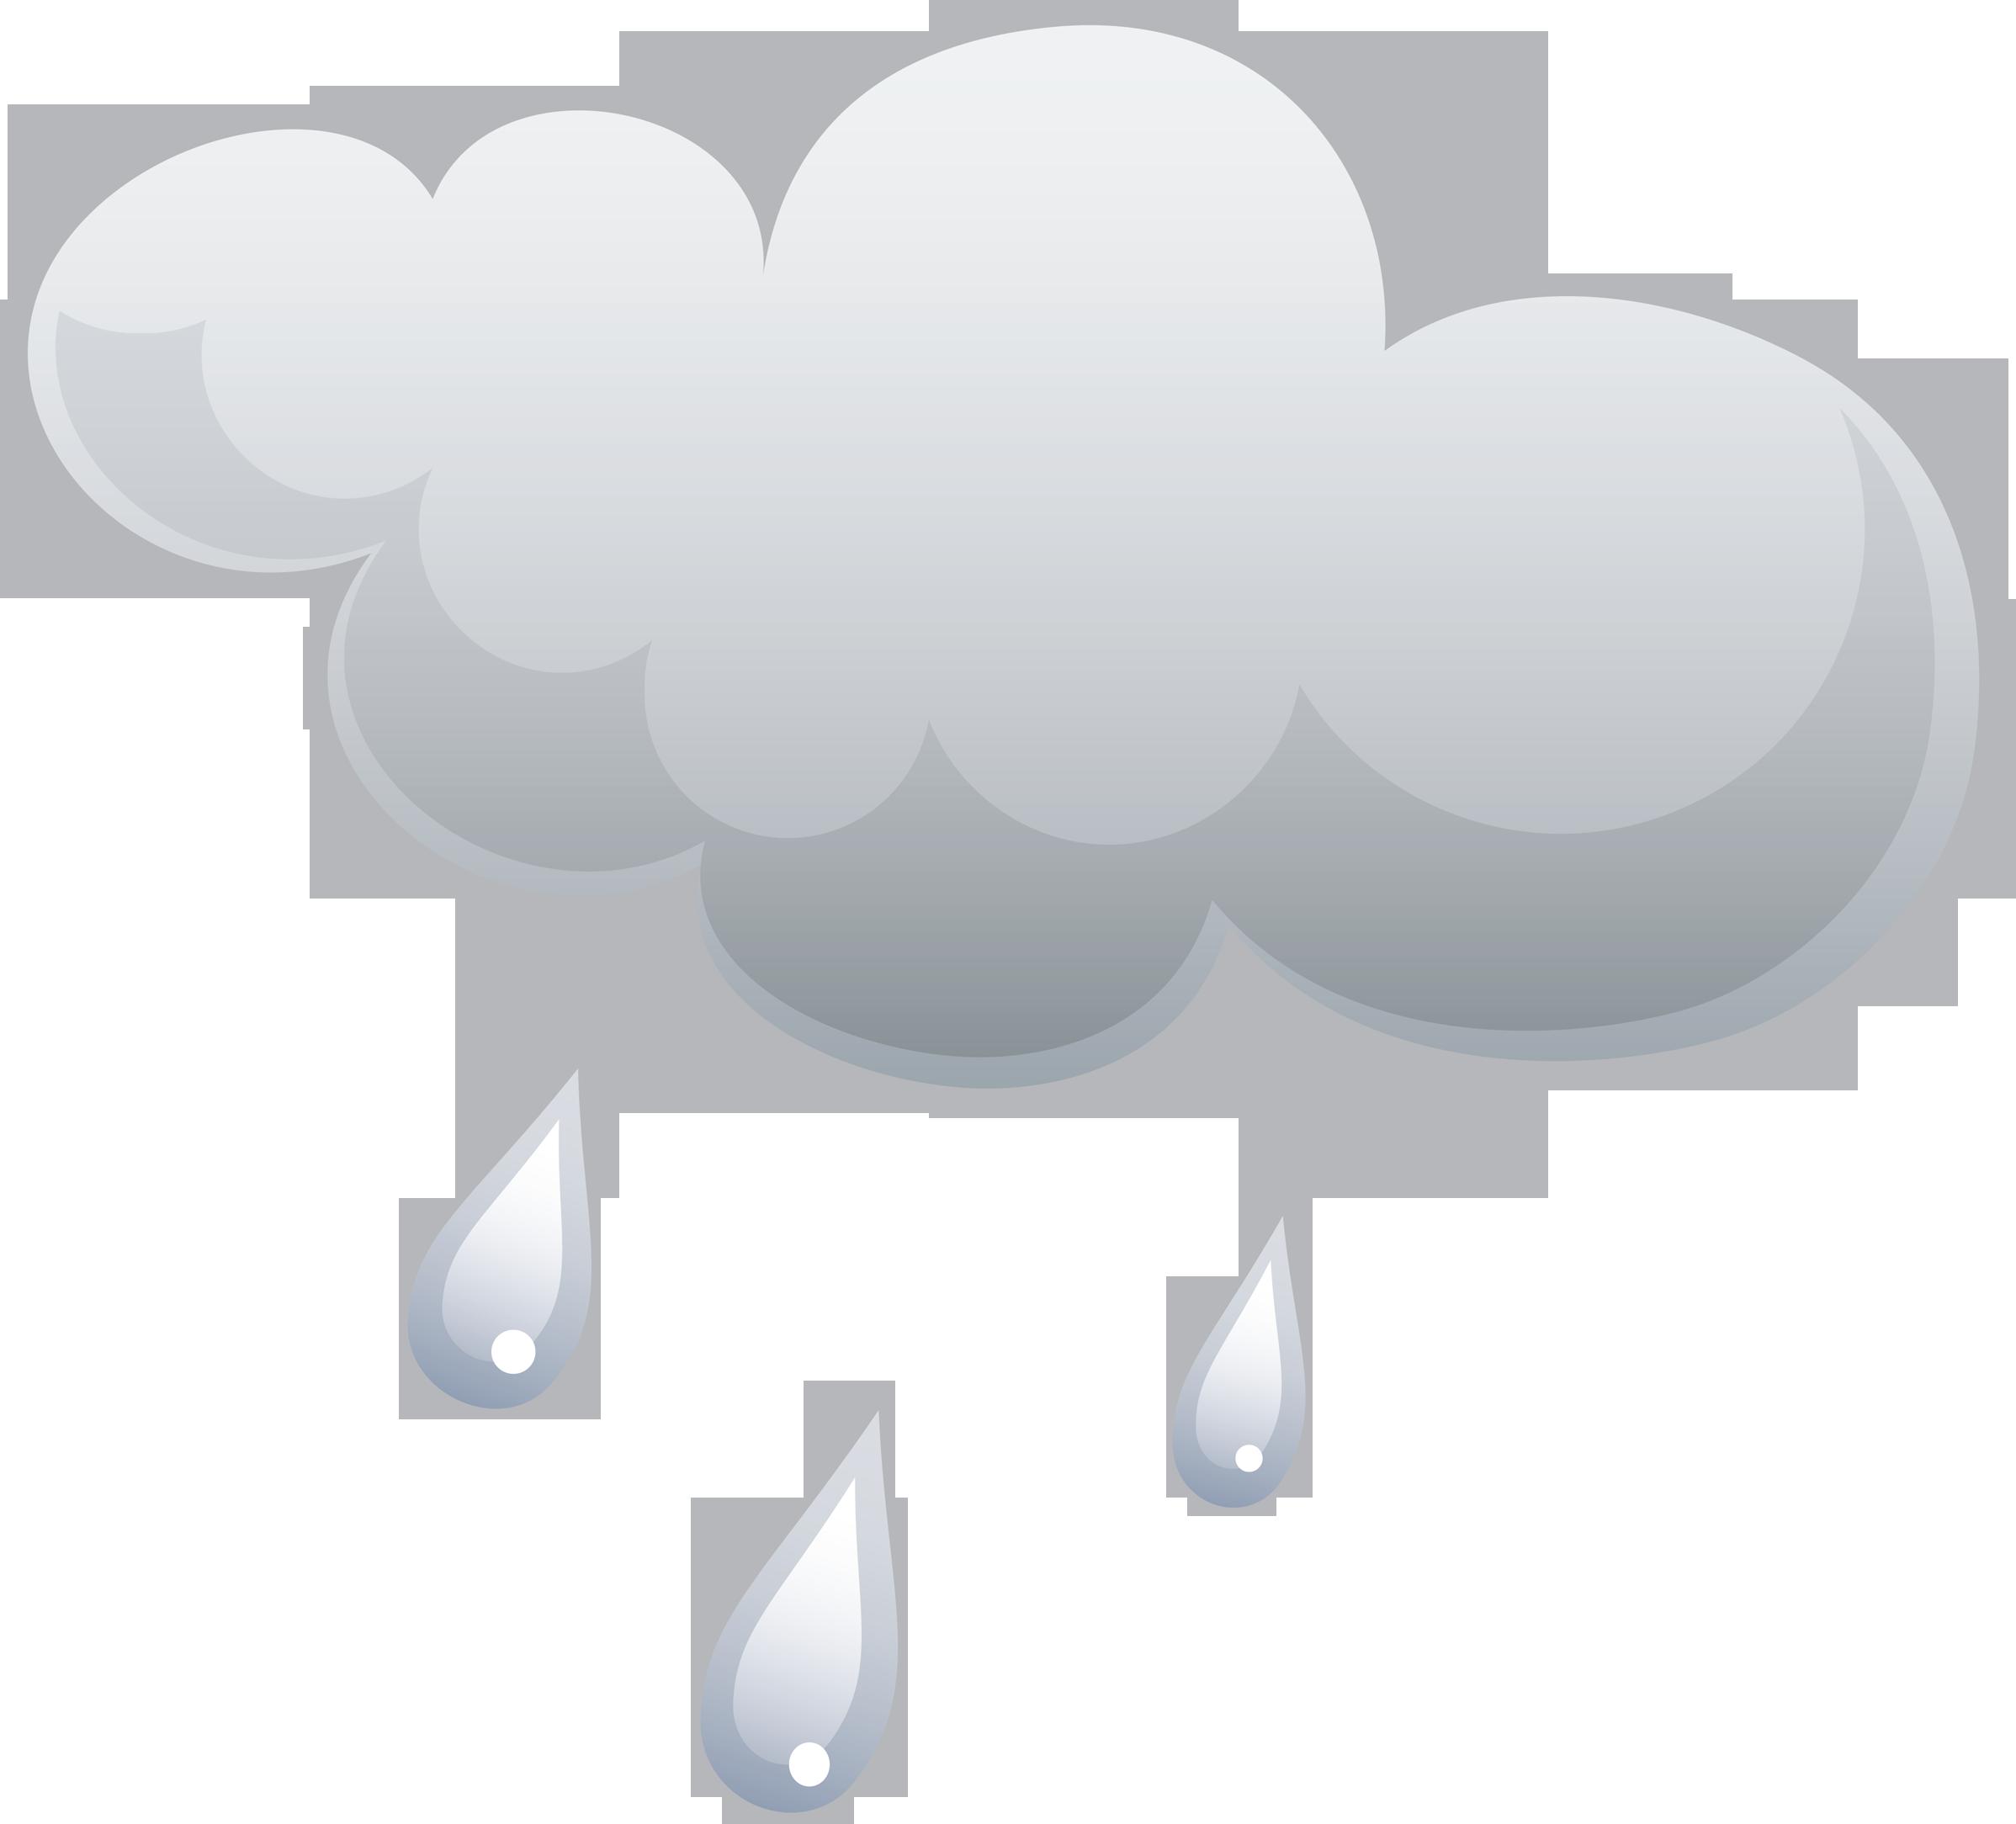 Дождь и гроза картинки 4